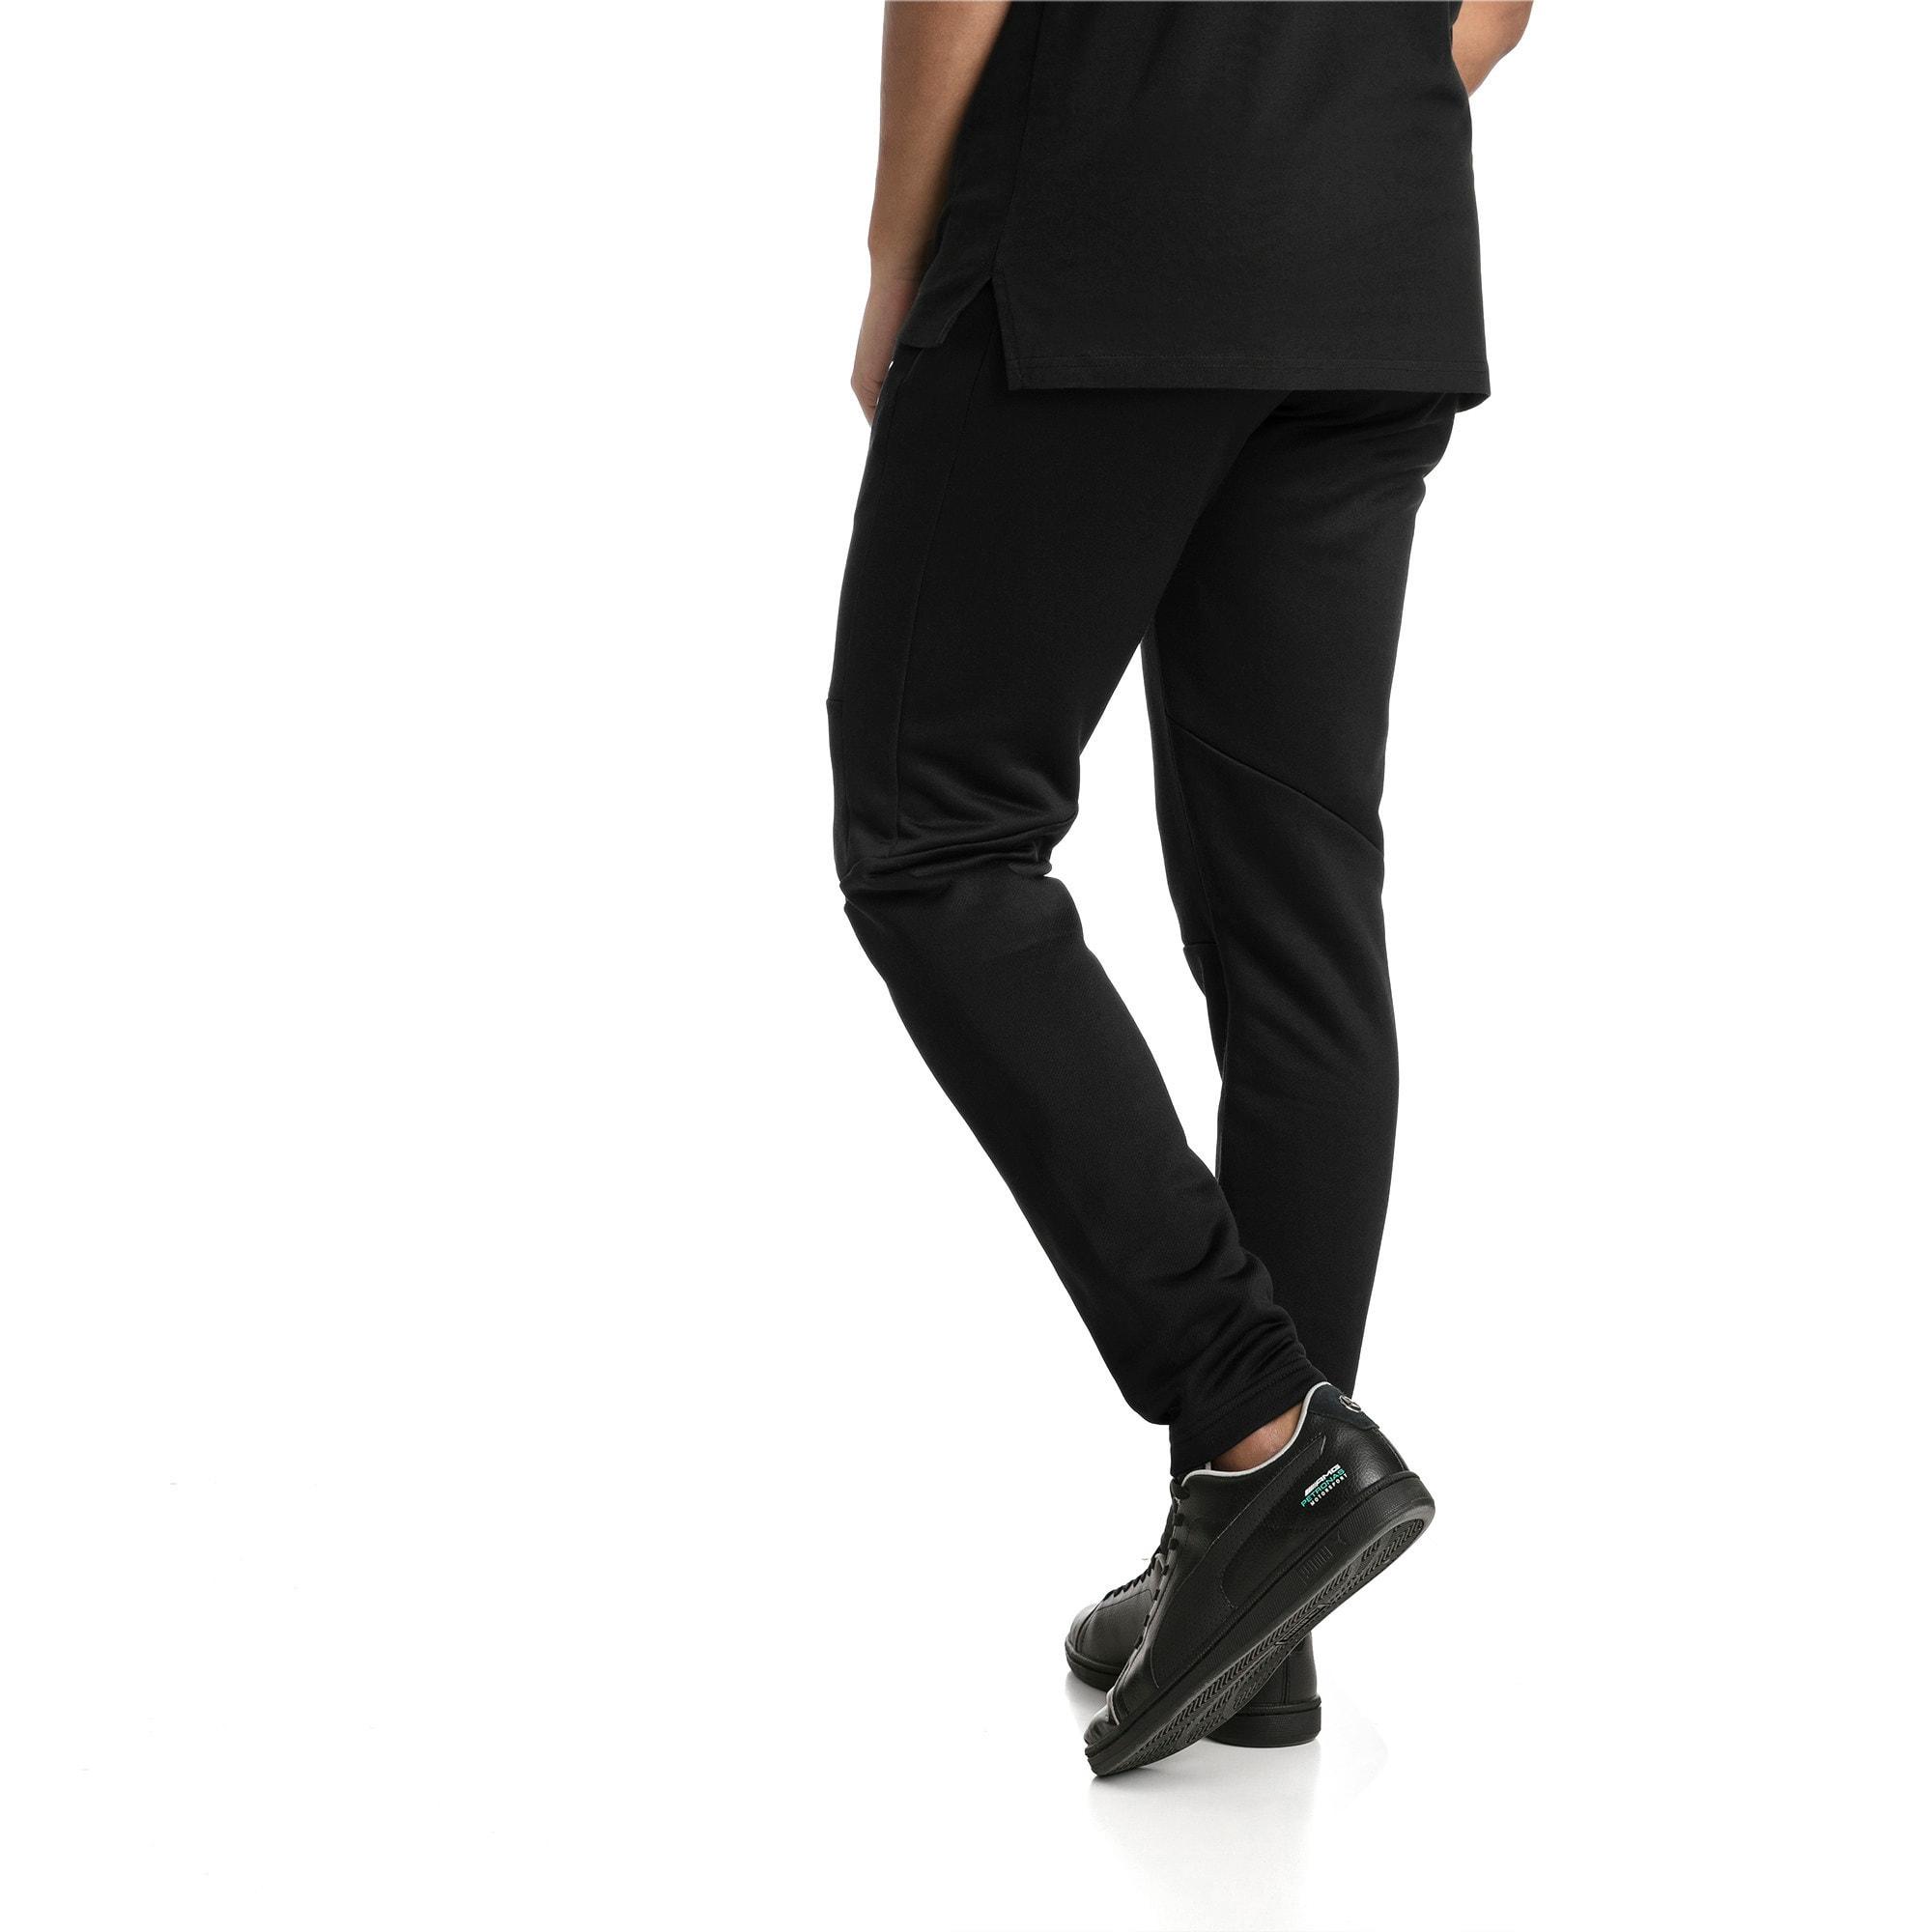 Thumbnail 3 of MERCEDES AMG PETRONAS Men's T7 Track Pants, Puma Black, medium-IND